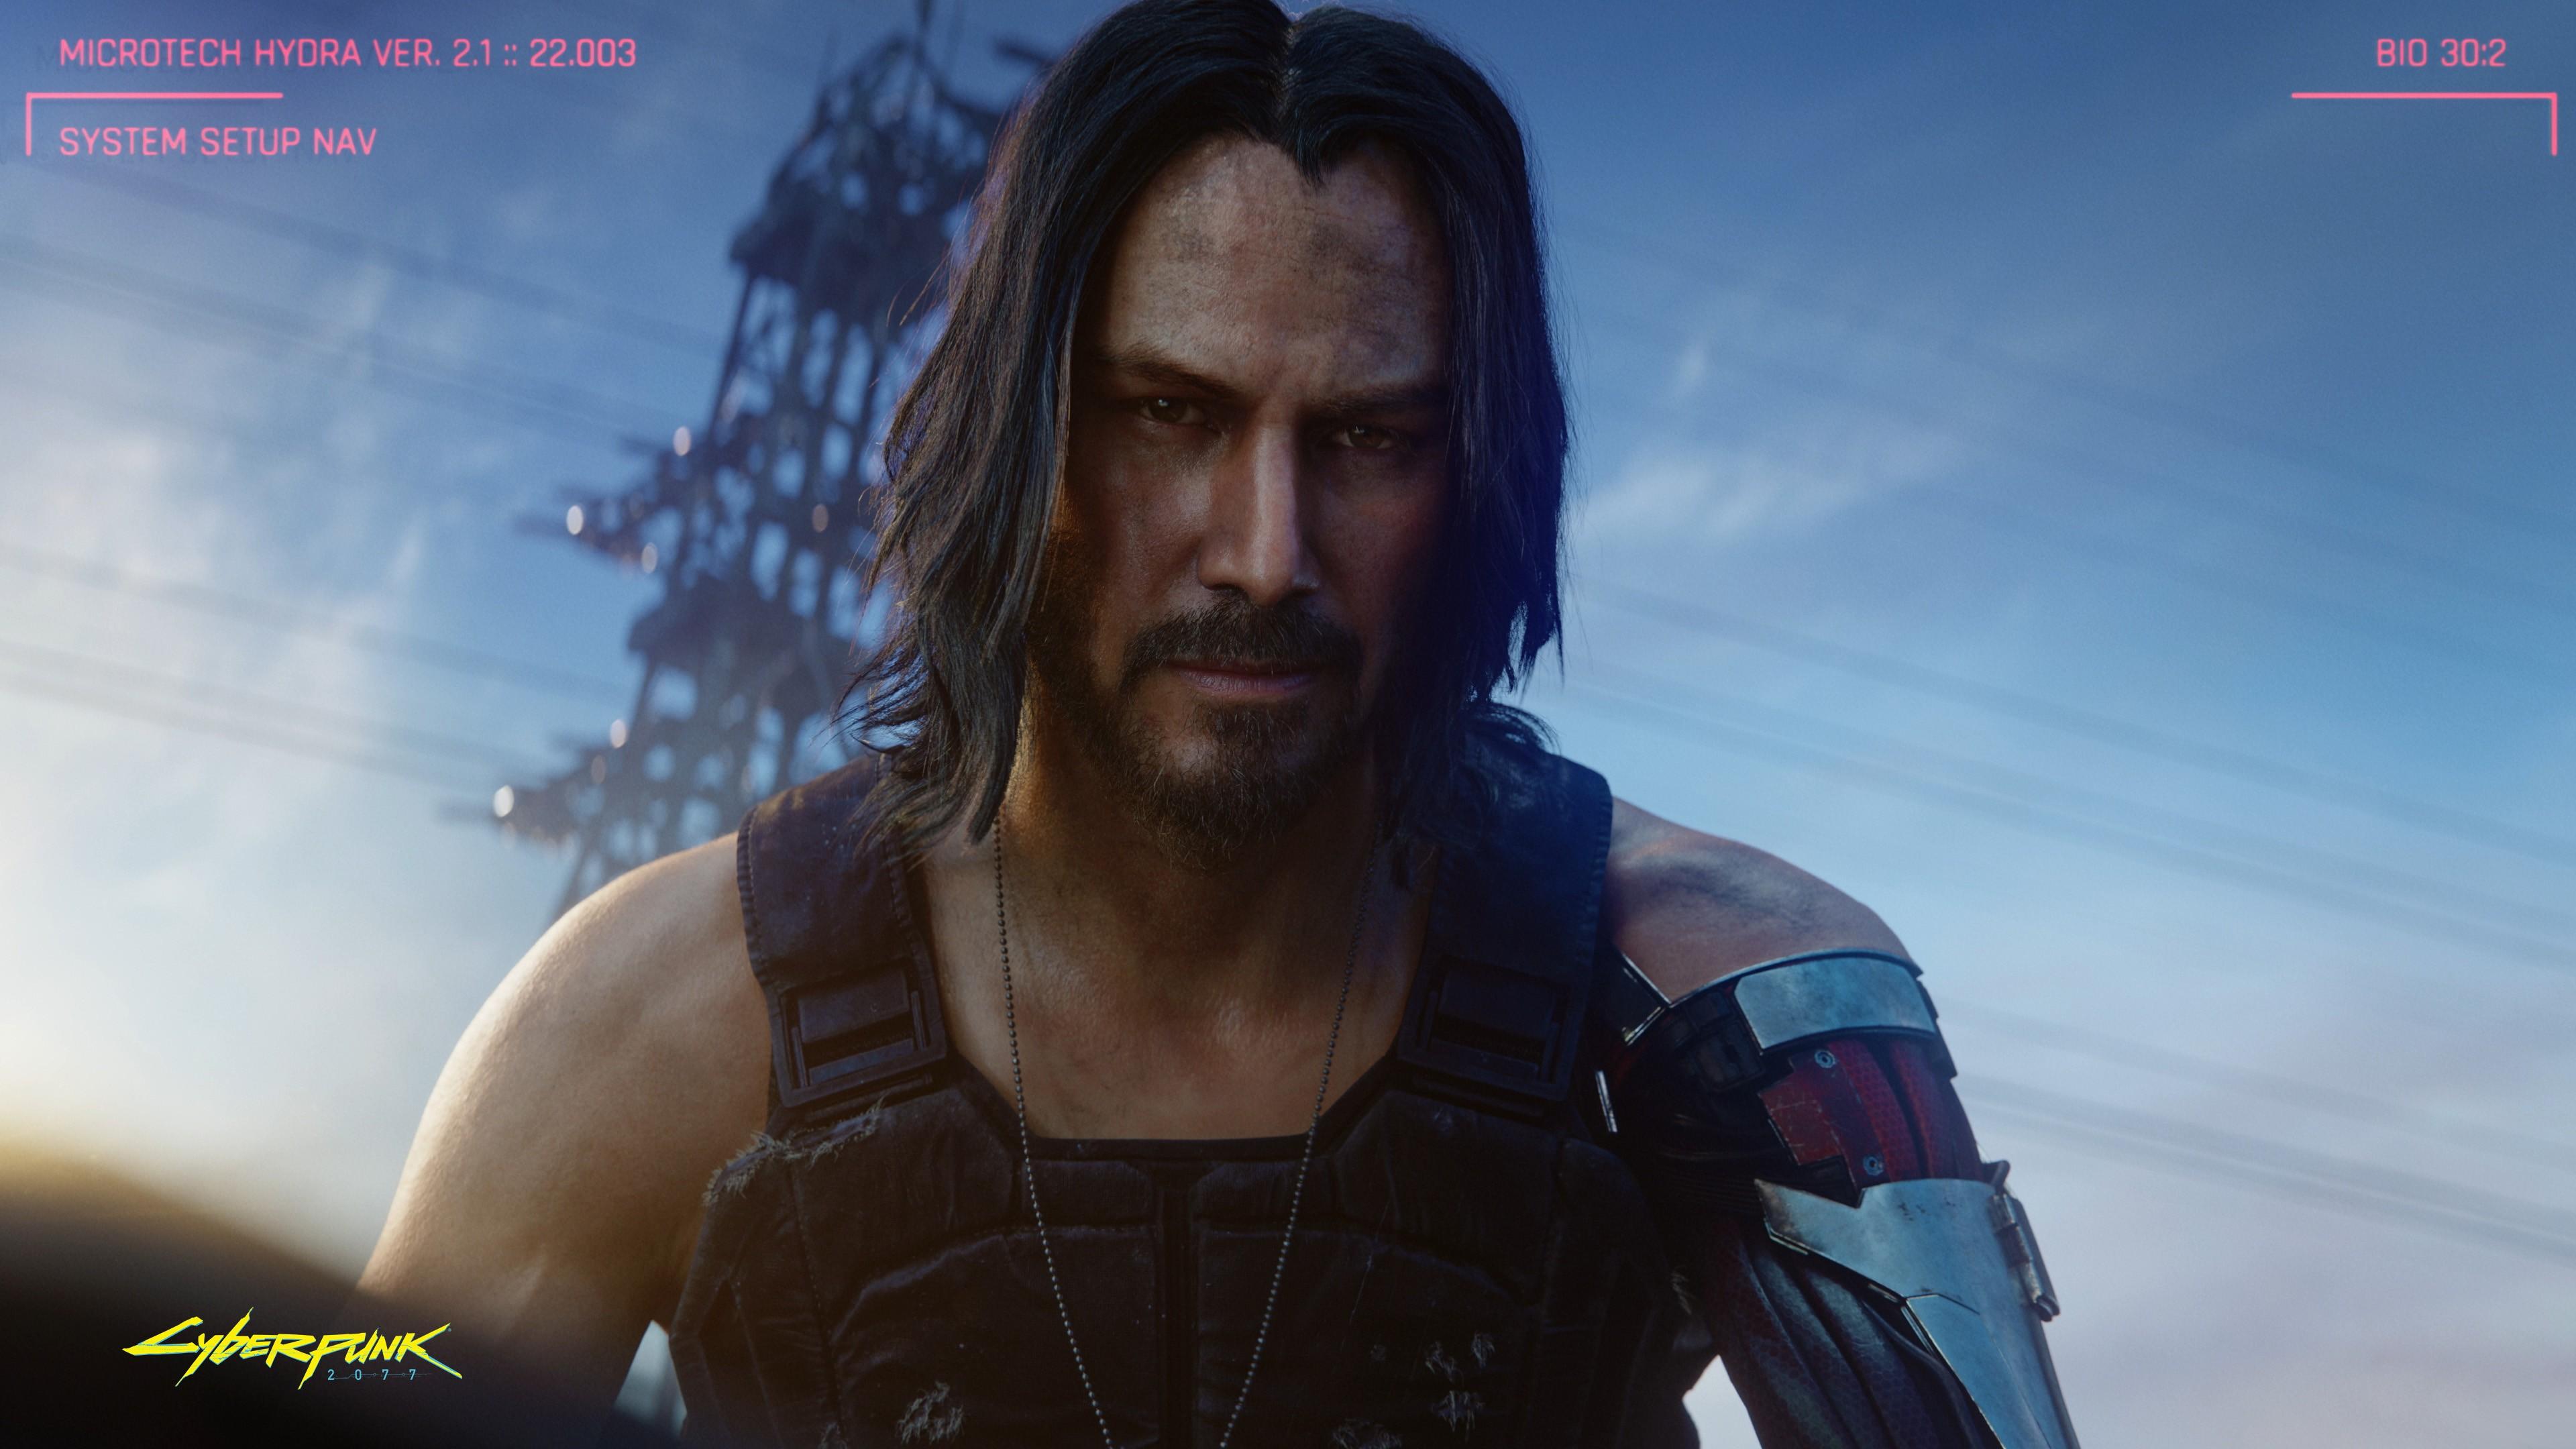 Wallpaper Cyberpunk 2077 with Keanu Reeves